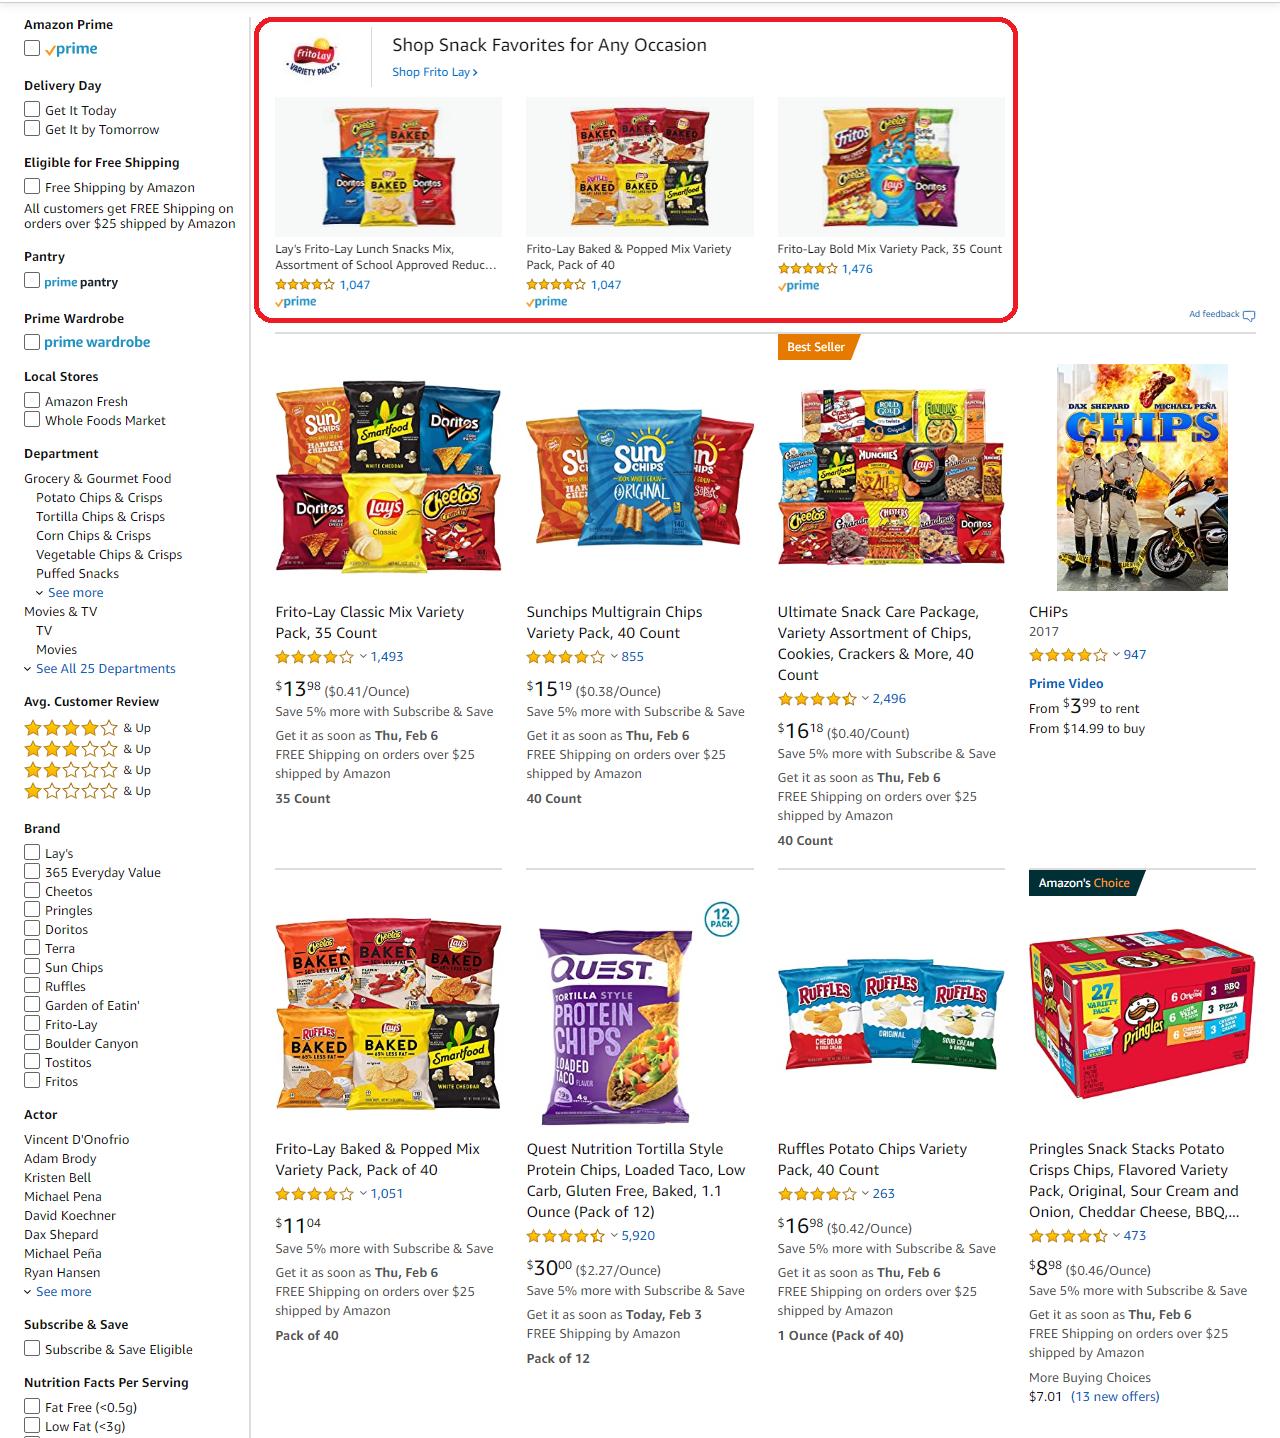 Amazon Advertising Sponsored Brands